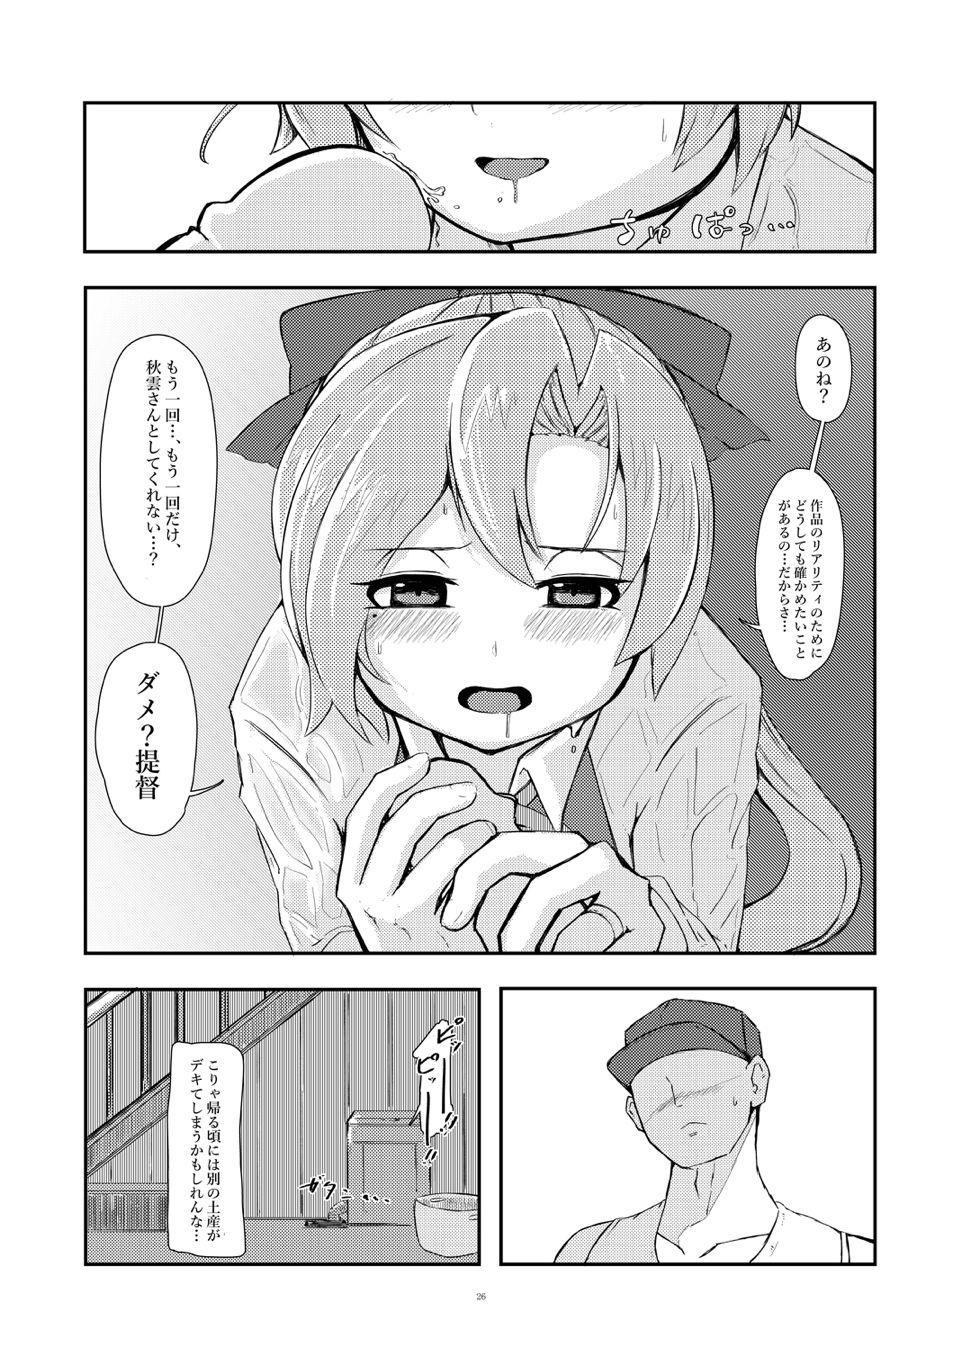 Hoshiwasure Misaki 24